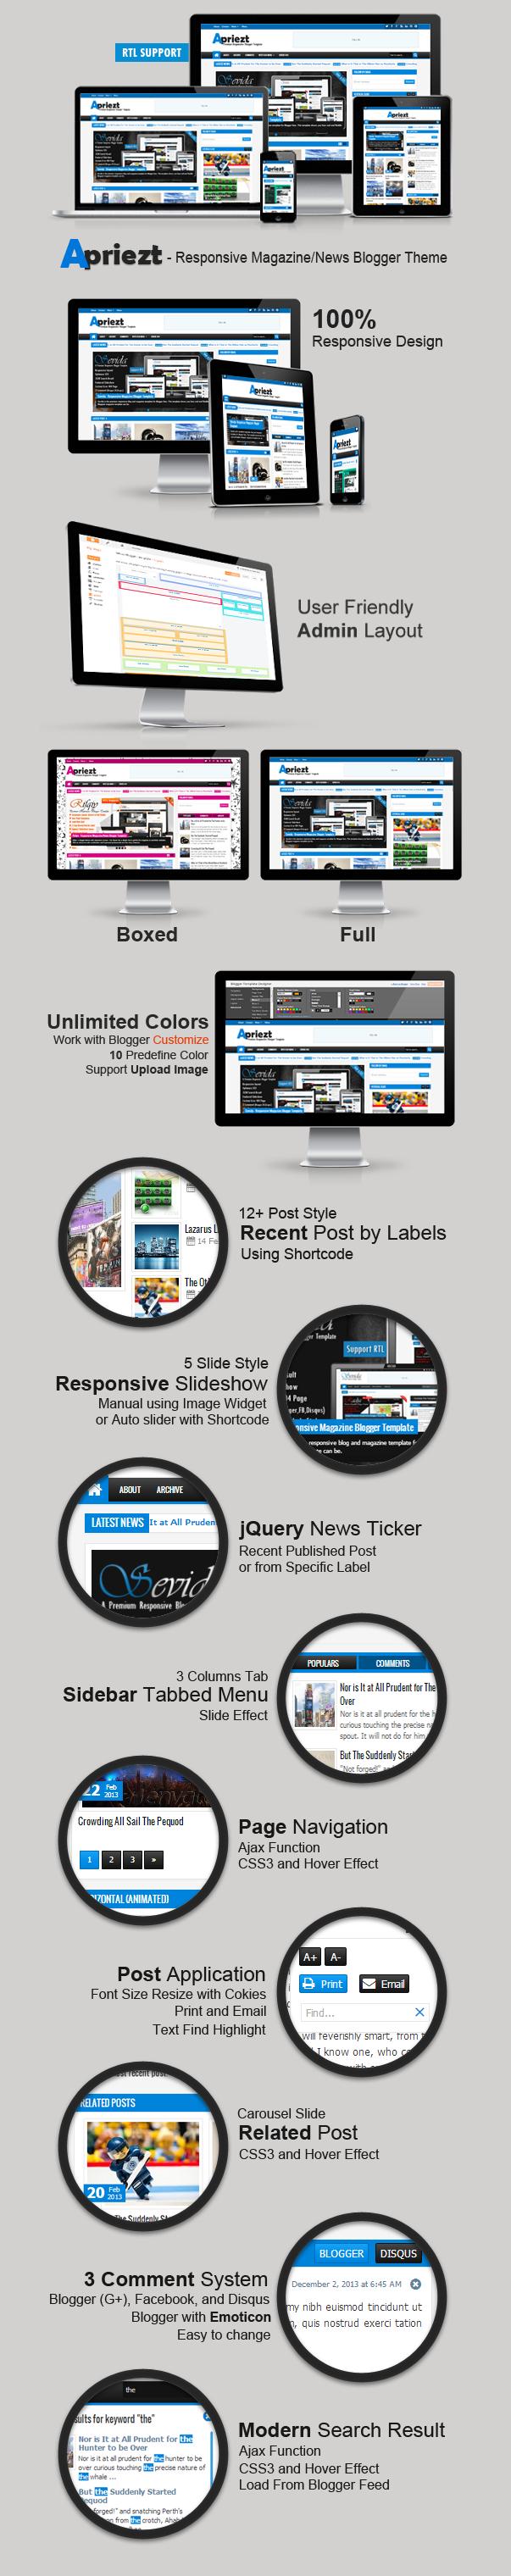 Apriezt Responsive Magazine/News Blogger Theme Features